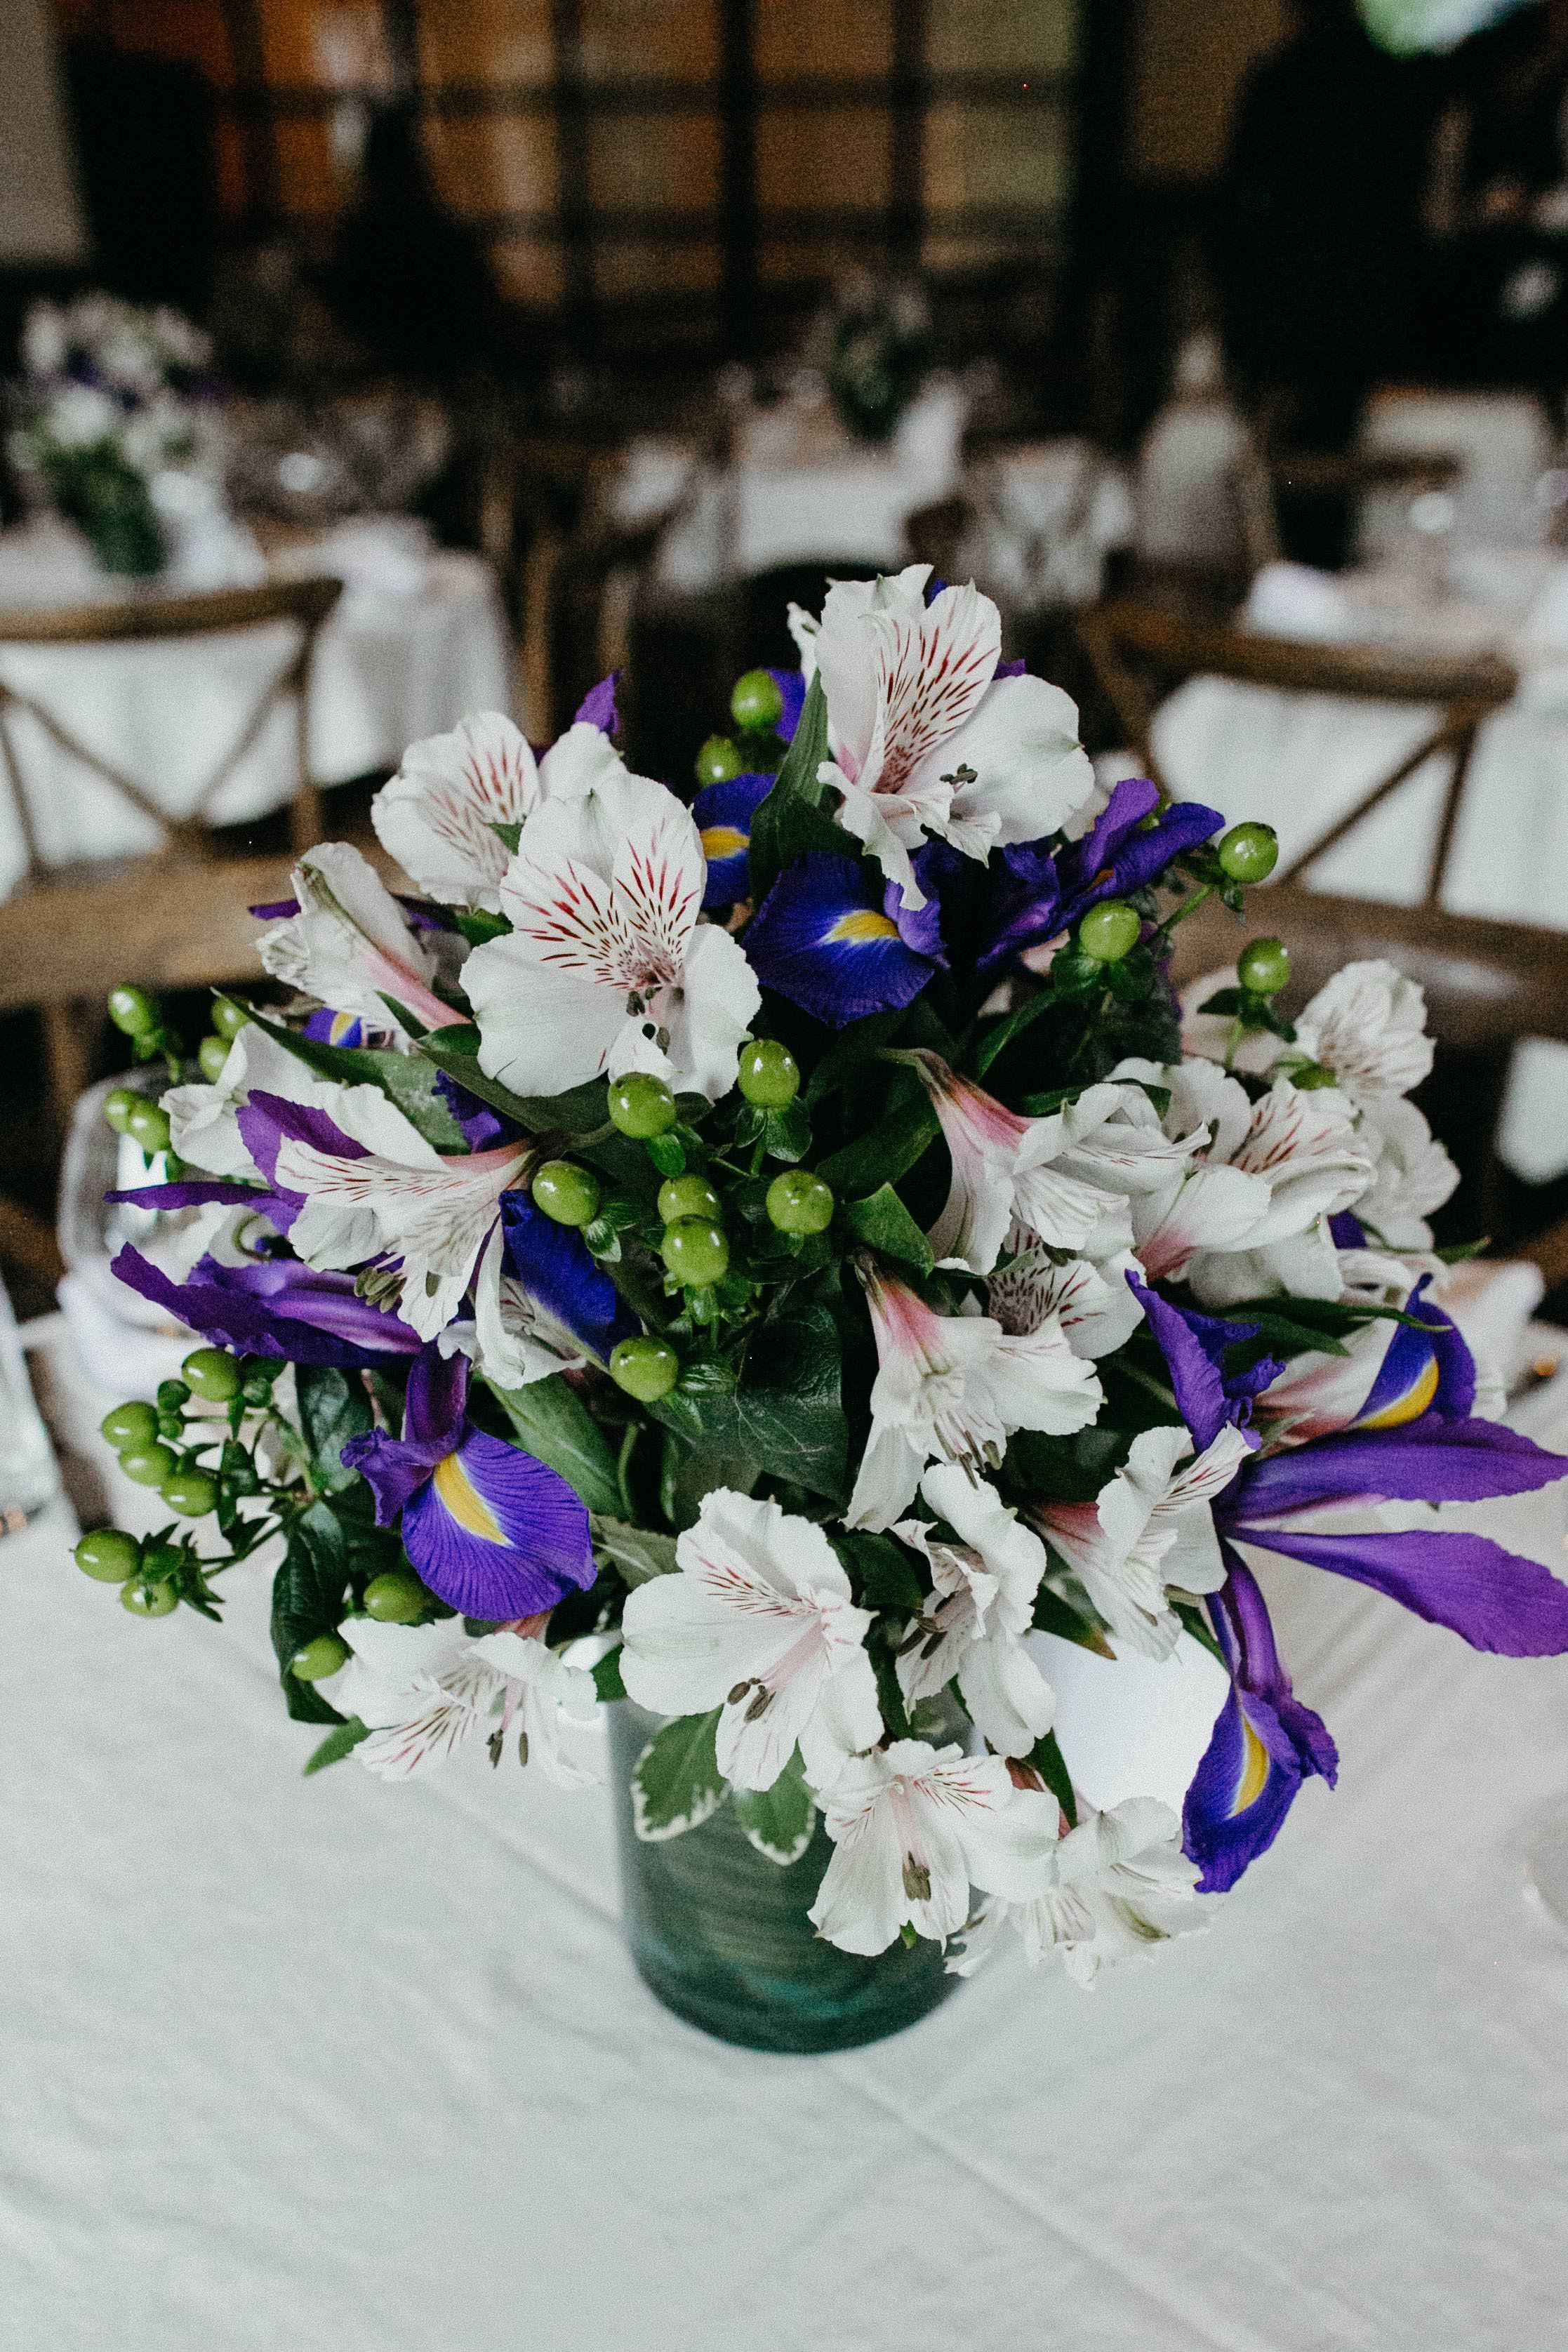 Sevlynn-Photography-Wedding-LIC-Landing-Maiella-NYC-54.jpg